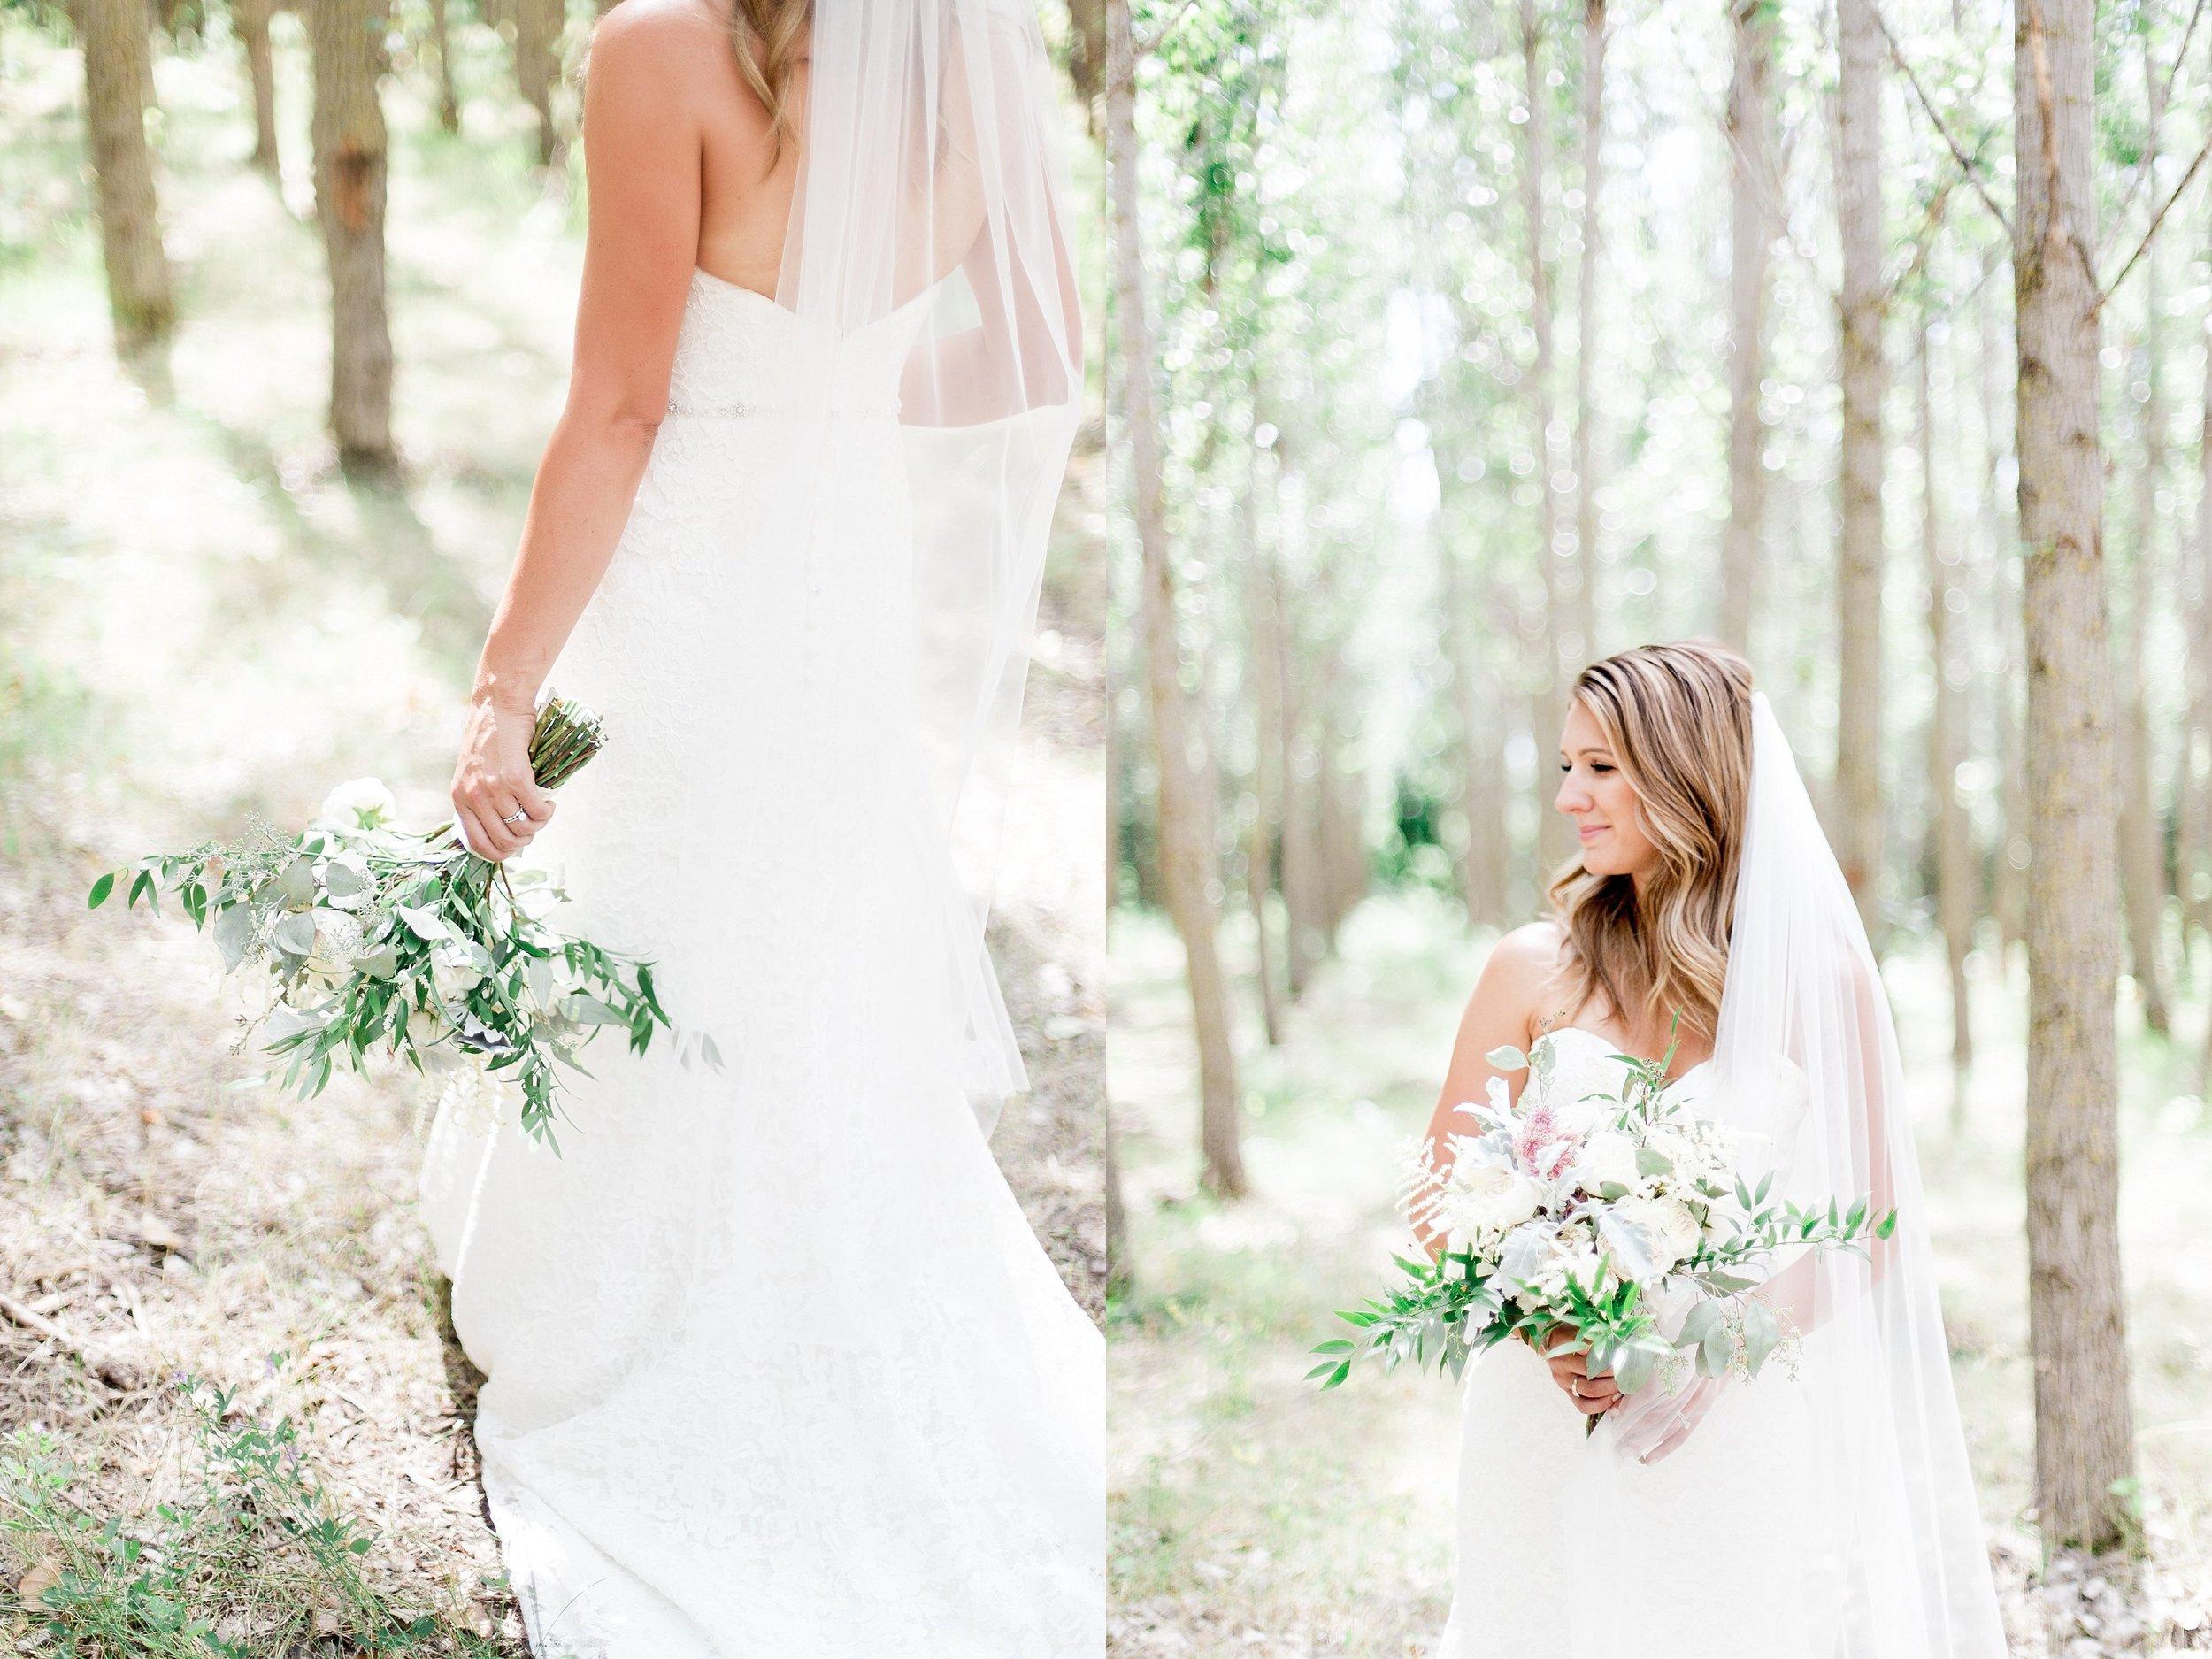 Winnipeg Wedding Photographer Keila Marie Photography   Bridal portraits   Garden inspired wedding